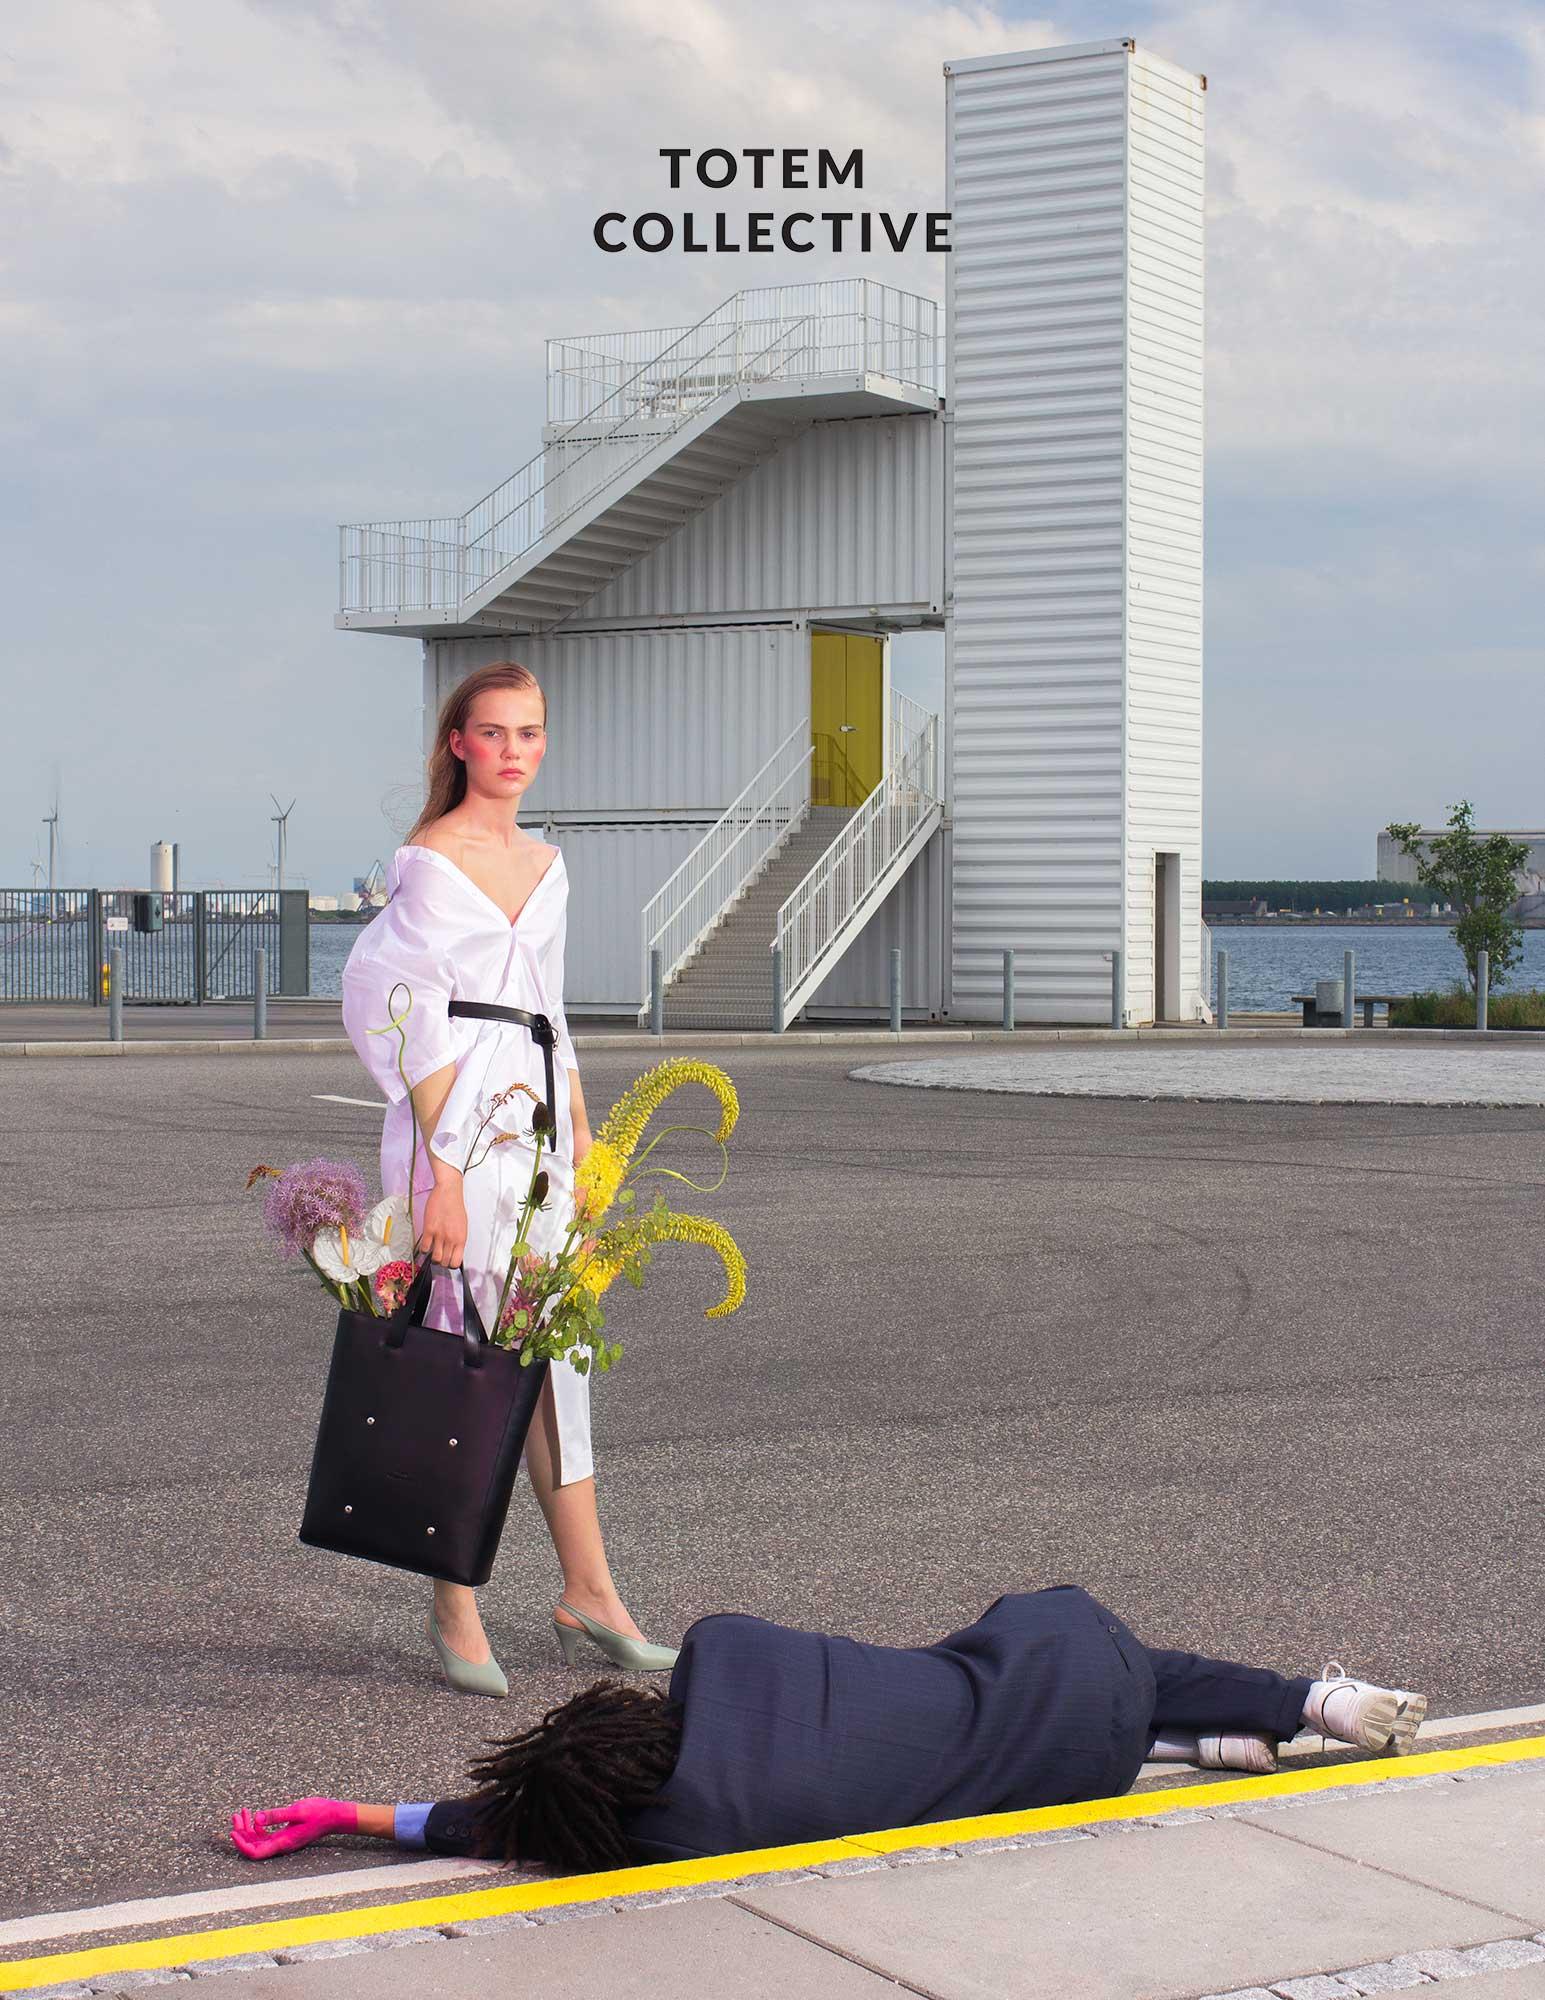 CHRIS CALMER ADVERTISING